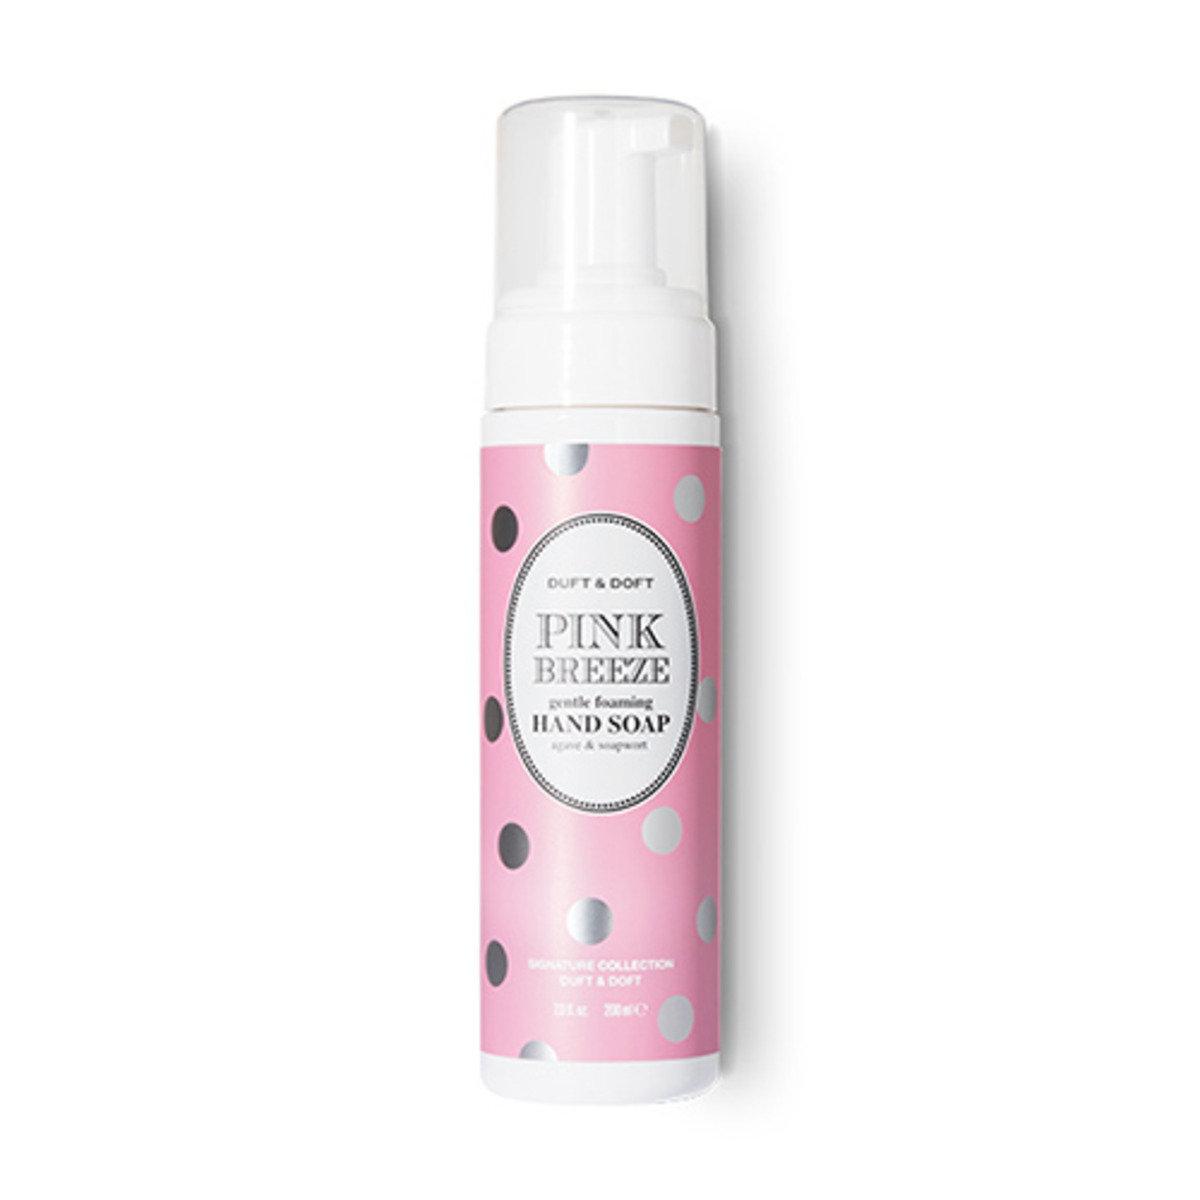 Pink Breeze 溫和泡沫洗手液